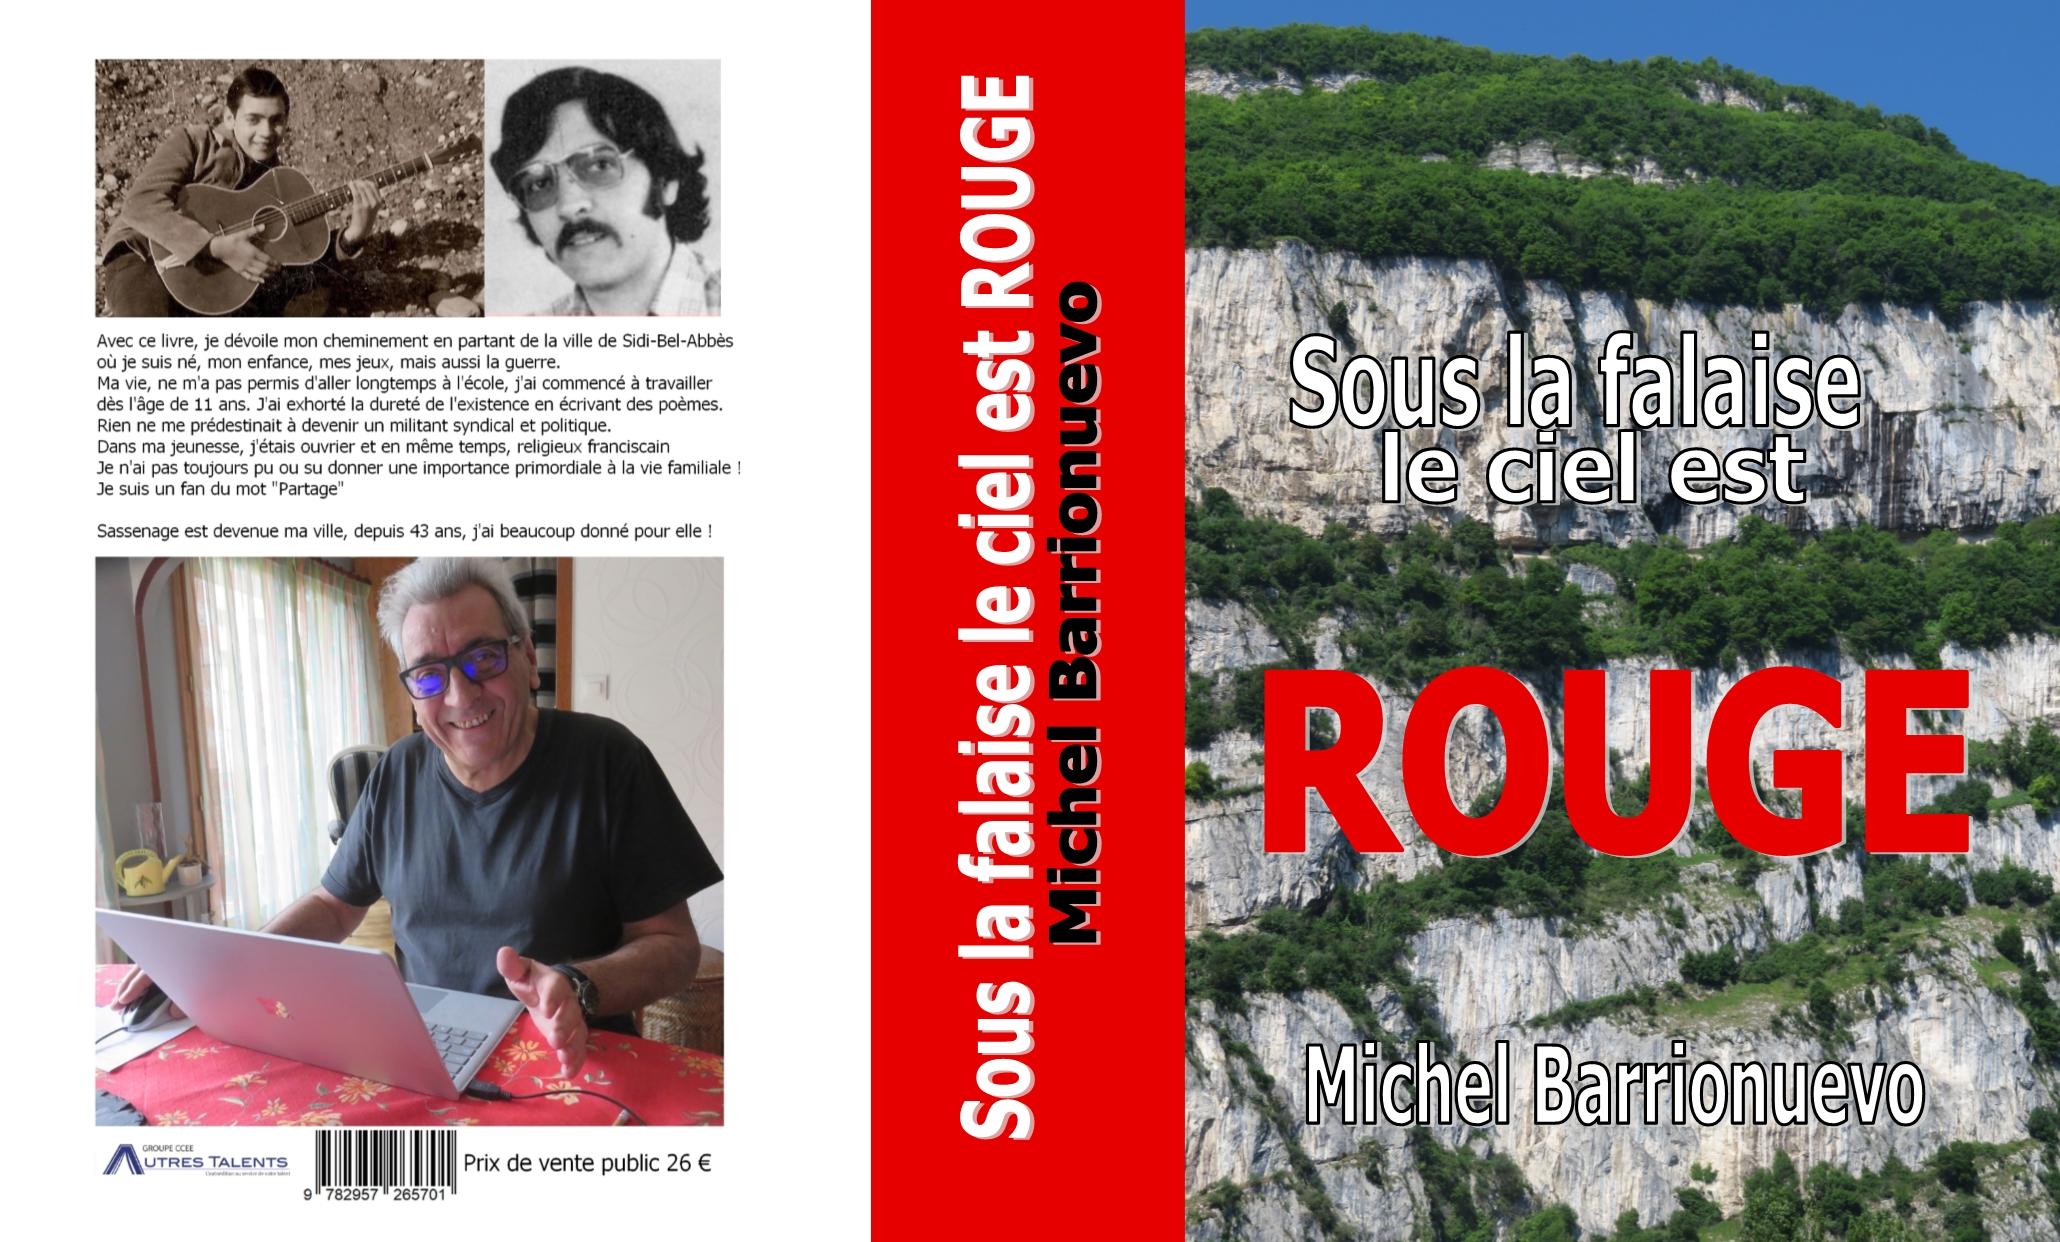 Le livre de Michel Barrionuevo